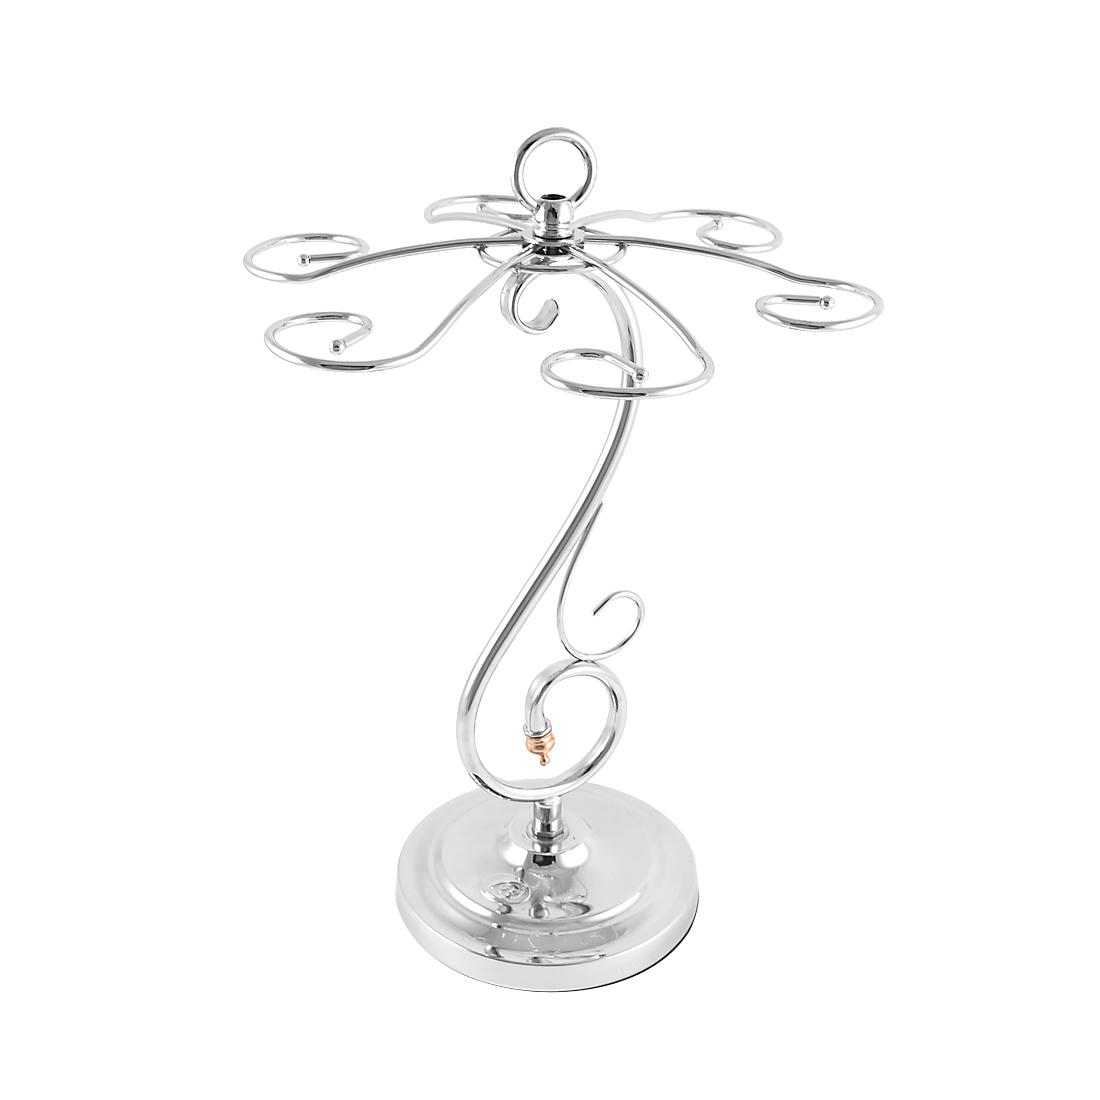 Metal Elegant Tabletop 6 Wine Glass Drying Rack Ring Display Stand Silver Tone